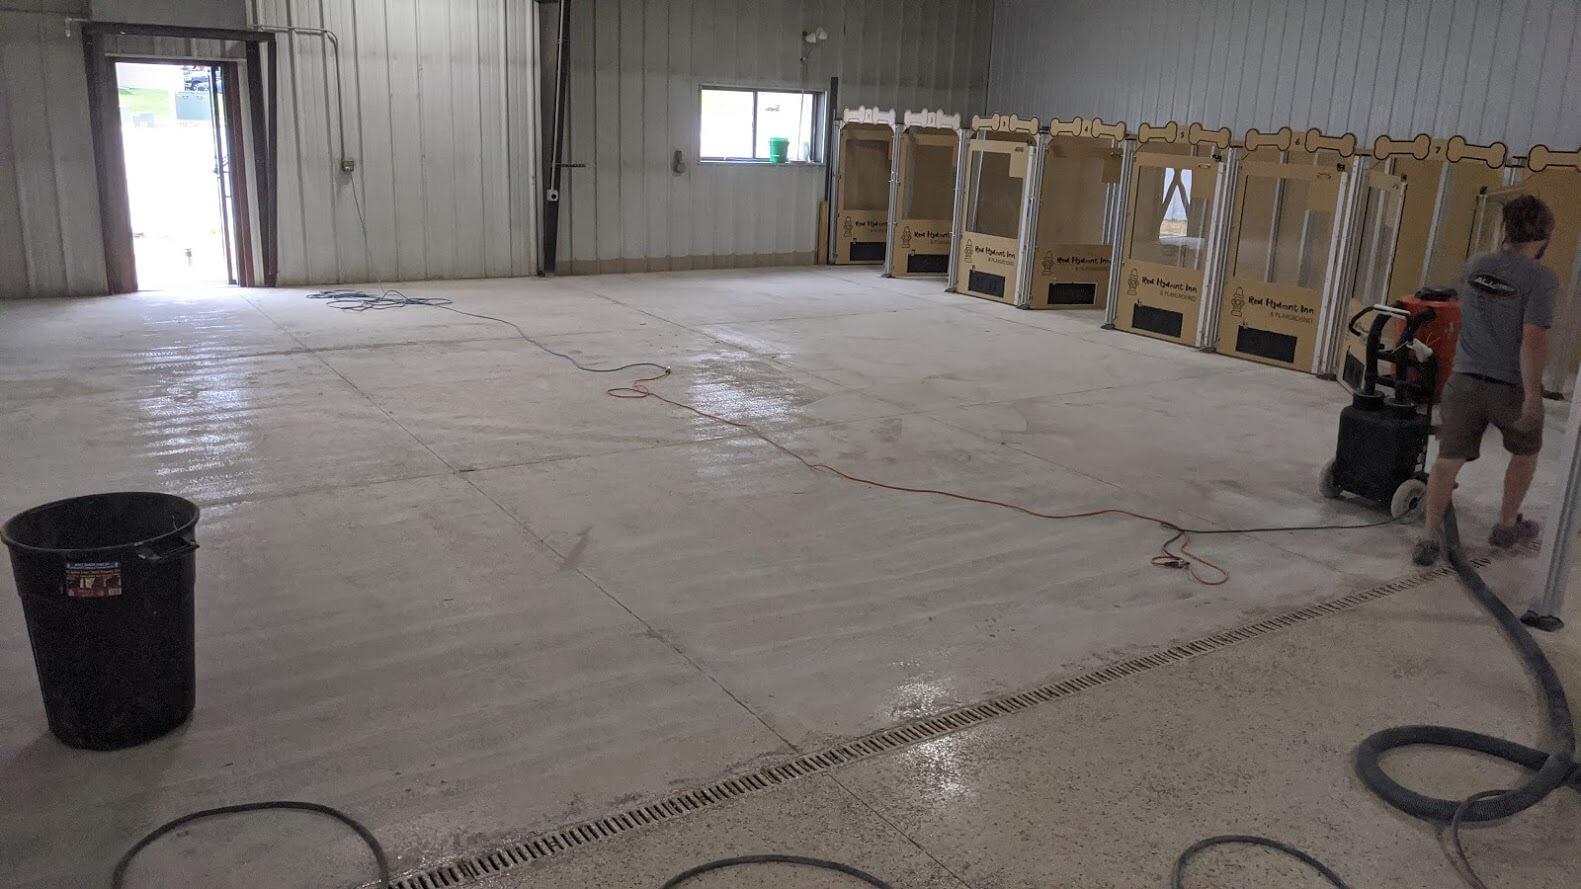 Sanding off old epoxy flooring.